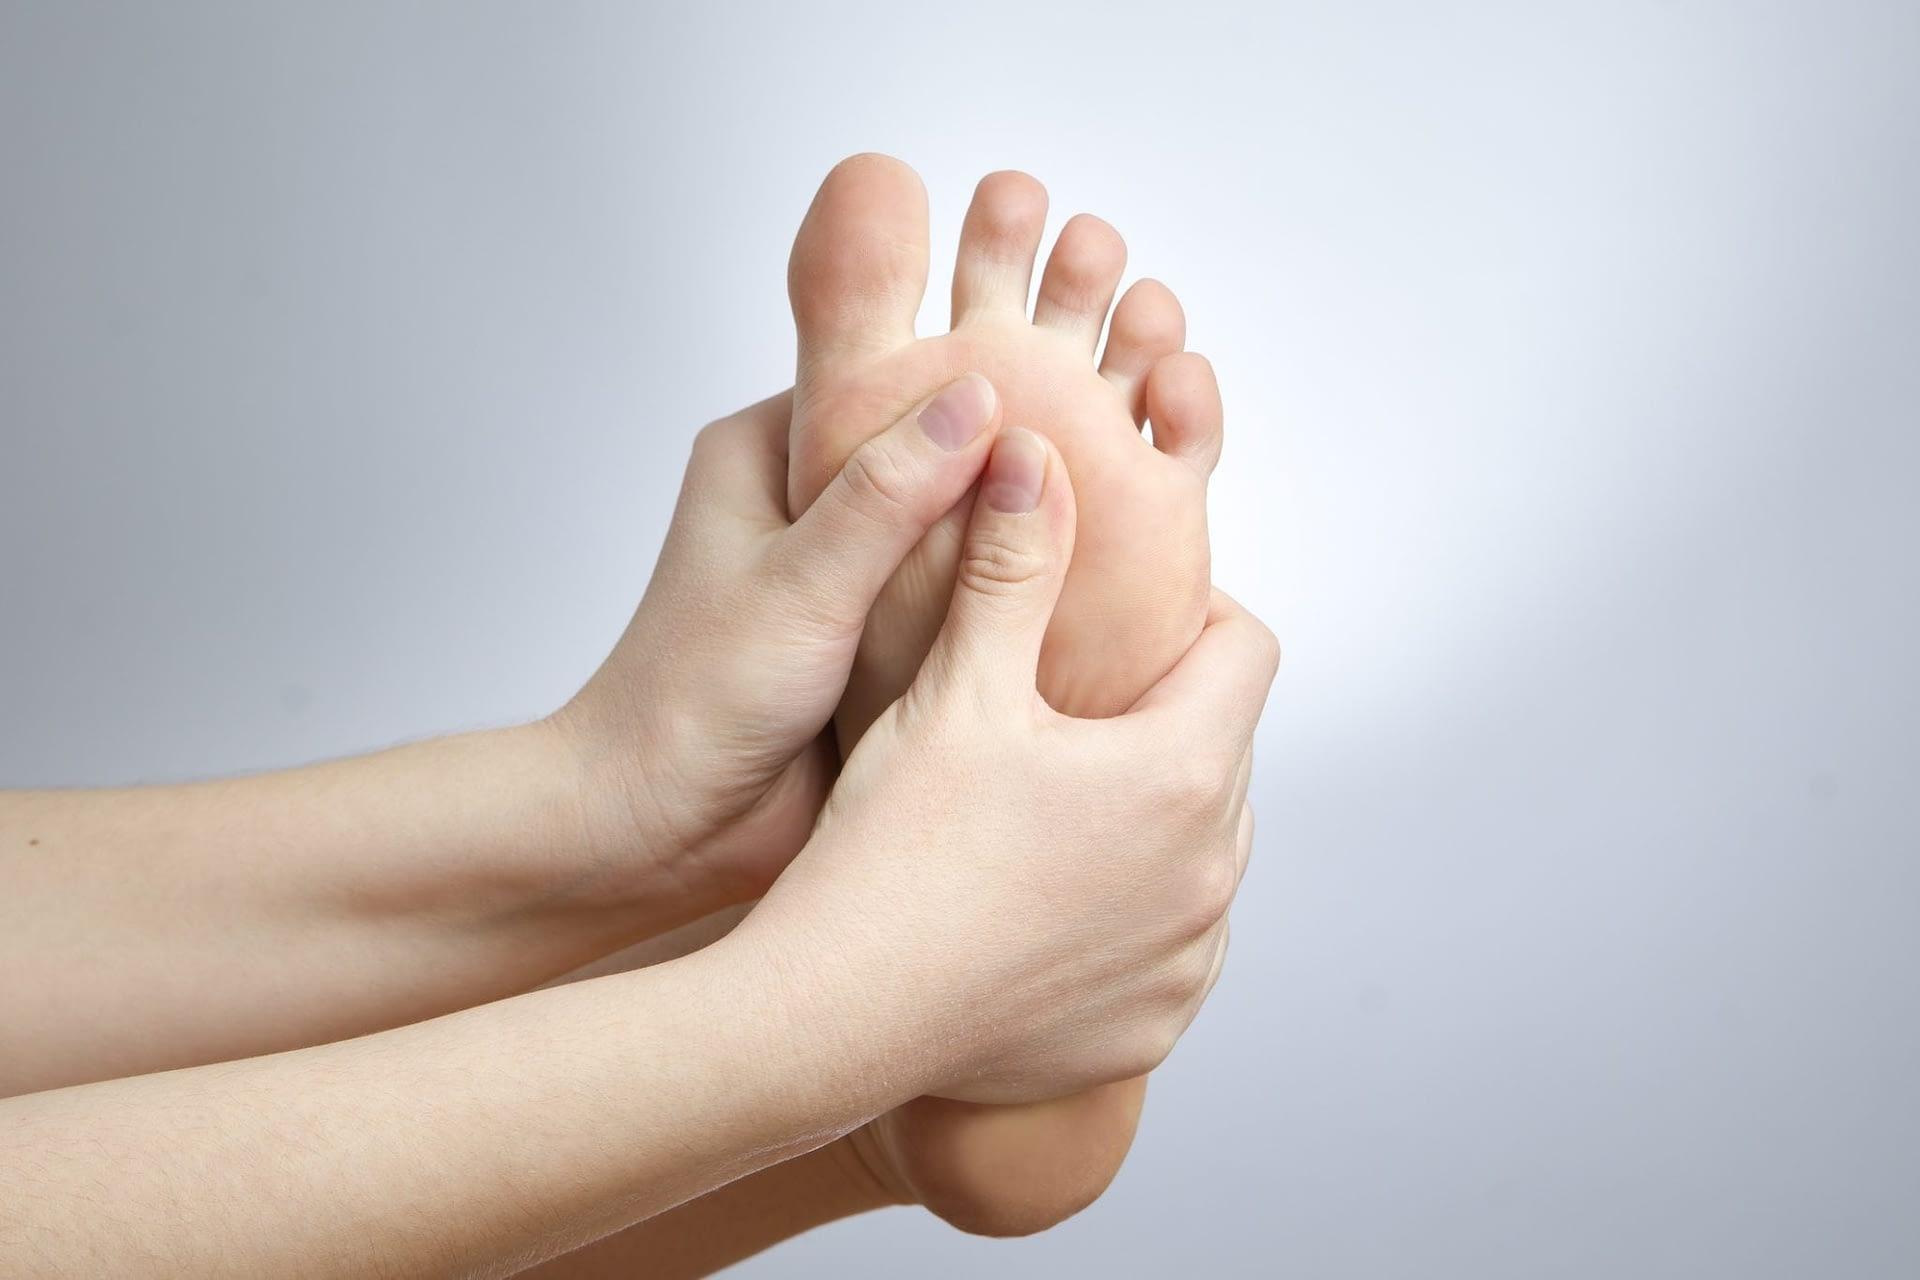 Diabetic Foot Care In Easton Pa Twin Rivers Podiatry